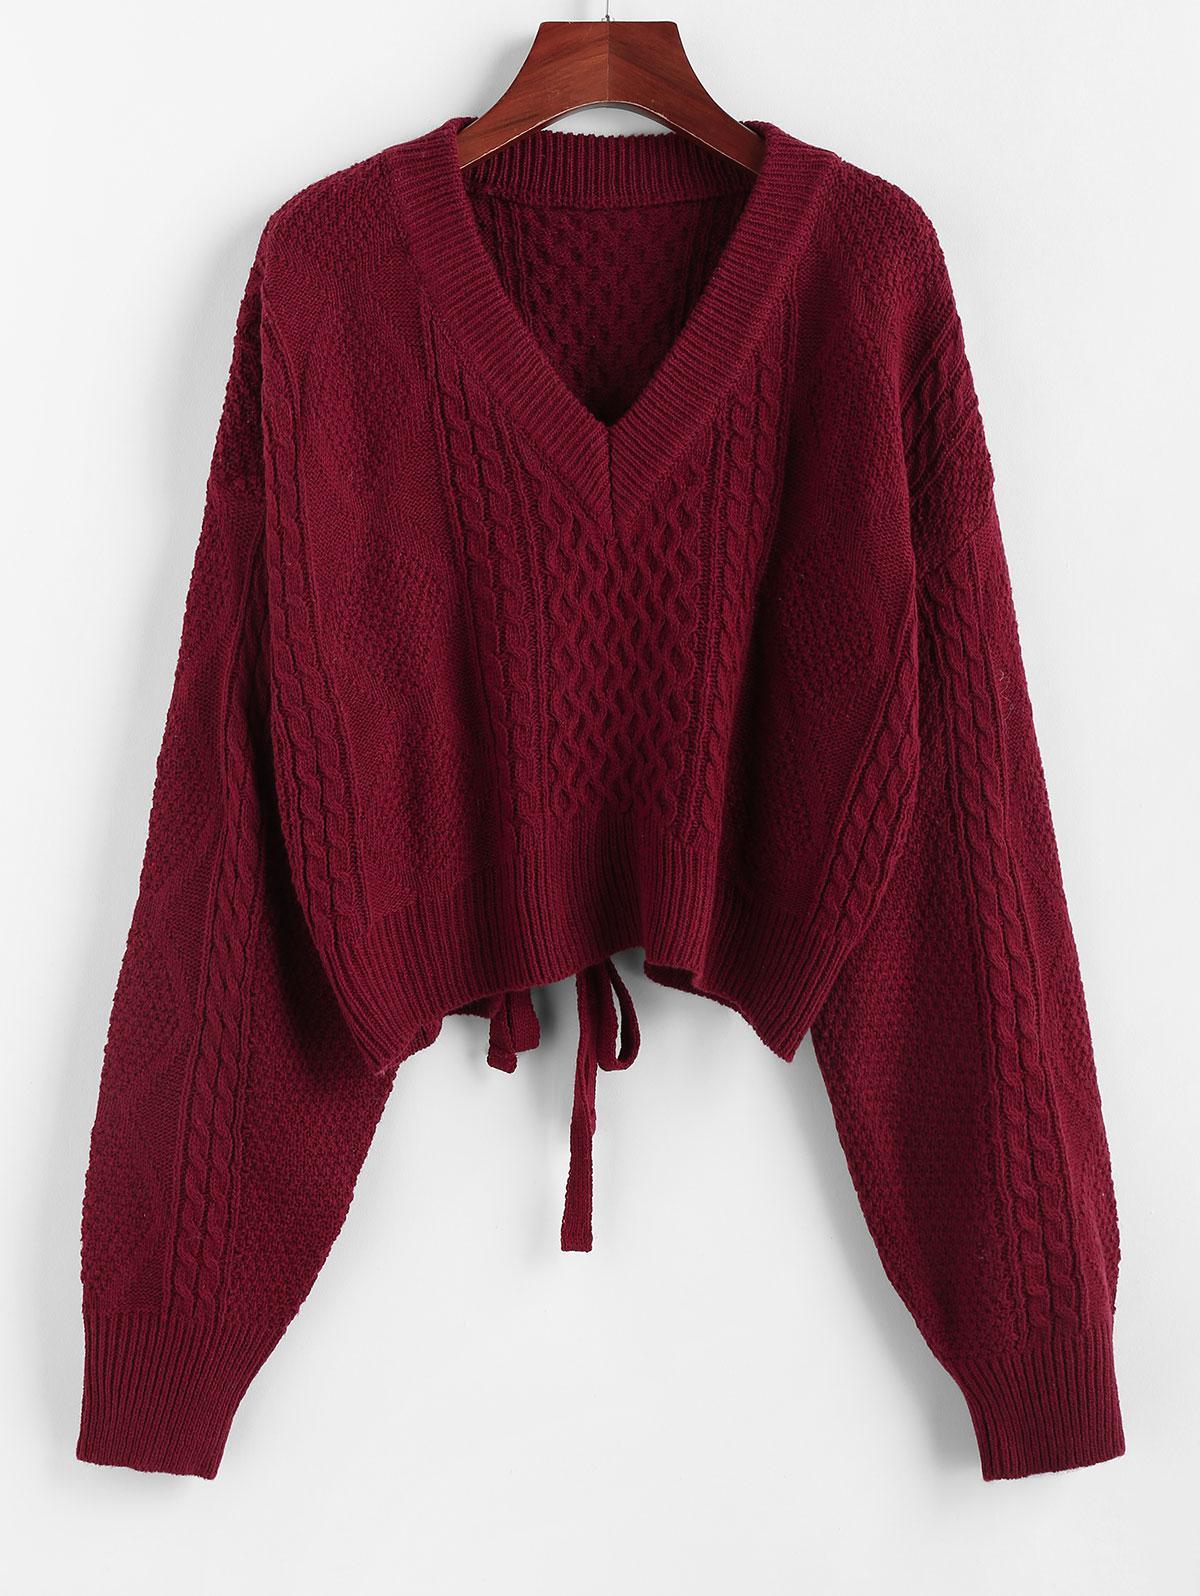 ZAFUL X Luna Montana Plunging Cutout Tie Back Crop Sweater